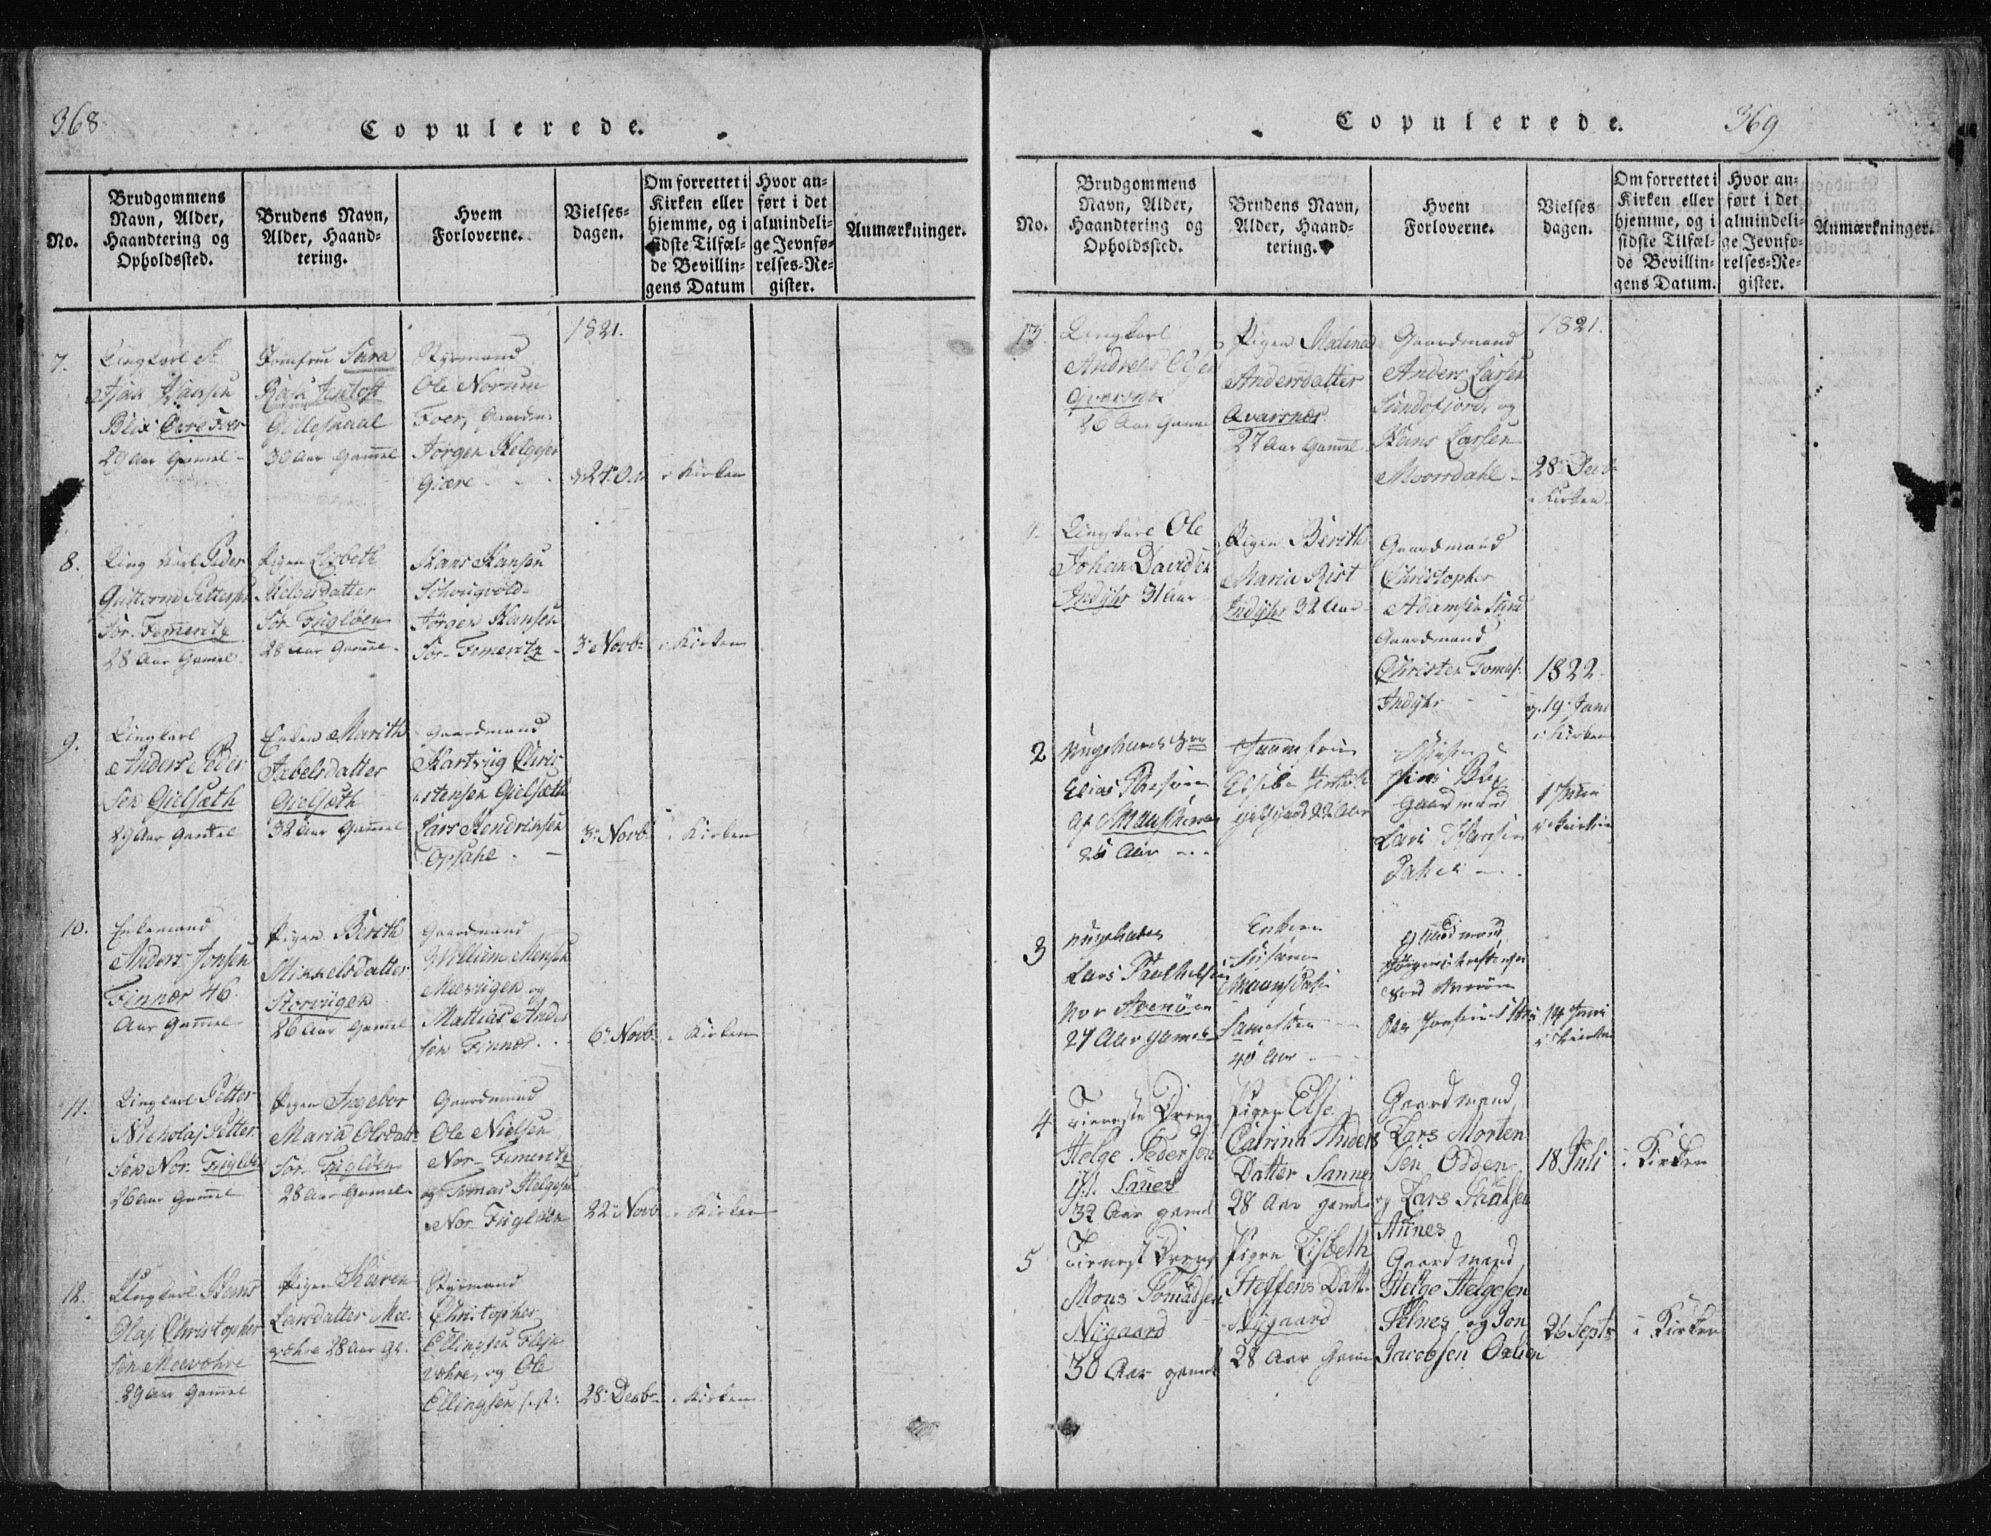 SAT, Ministerialprotokoller, klokkerbøker og fødselsregistre - Nordland, 805/L0096: Ministerialbok nr. 805A03, 1820-1837, s. 368-369